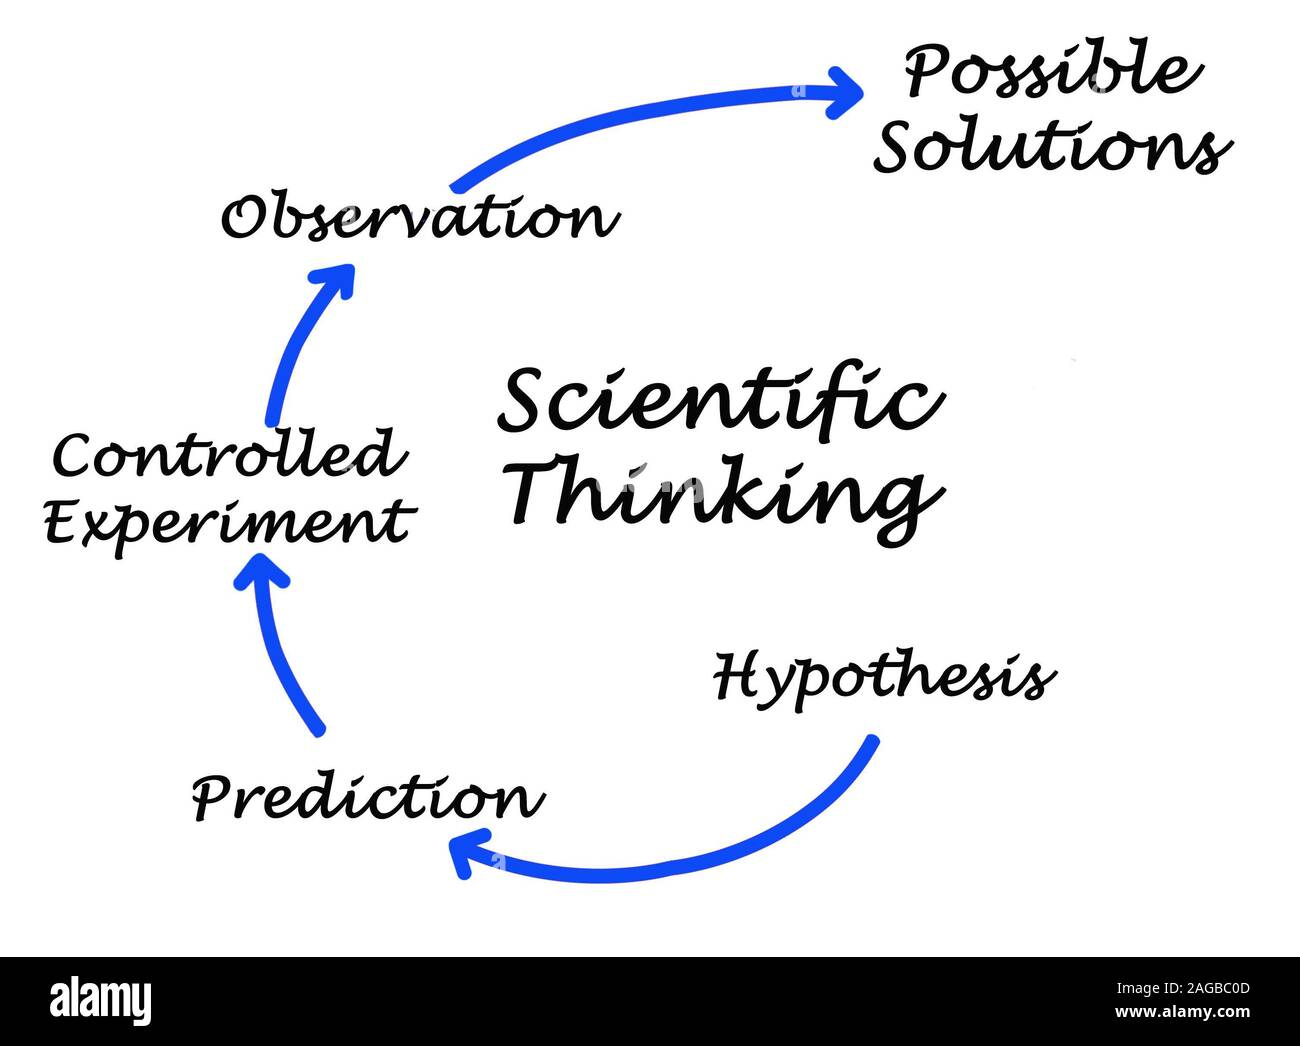 Scientific Thinking Stock Photo - Alamy